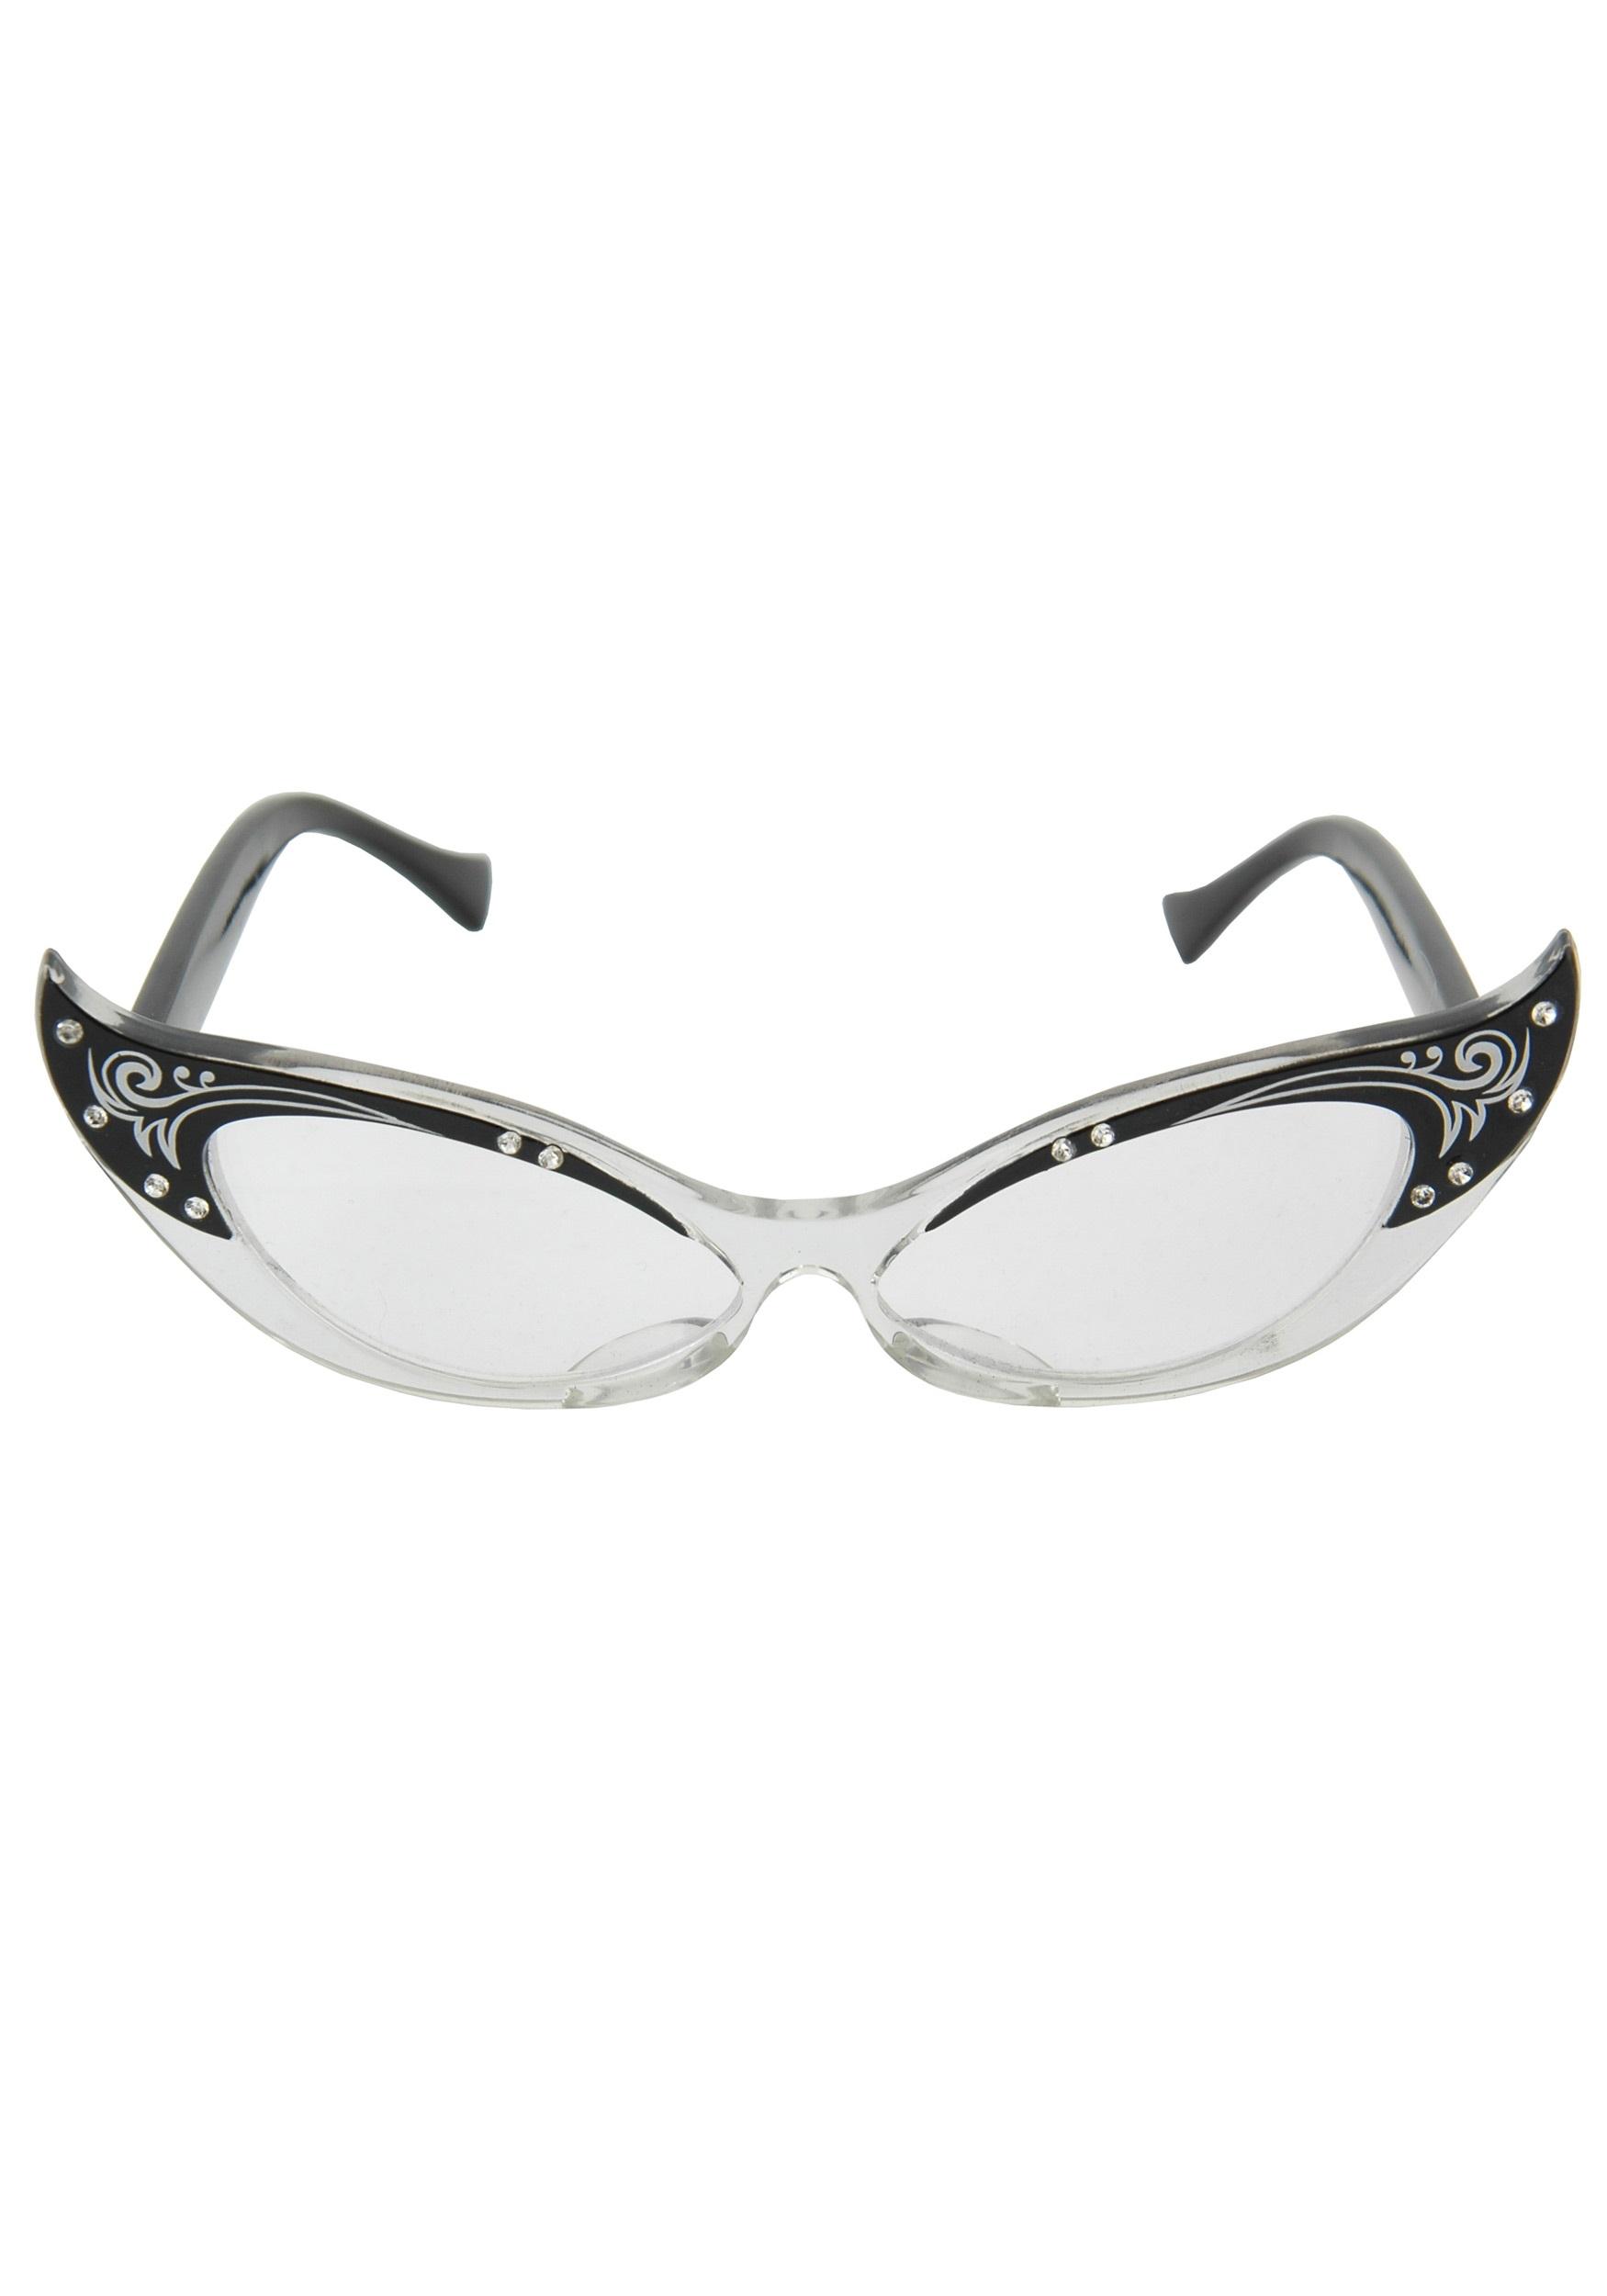 Vintage Cats Eye Glasses 85